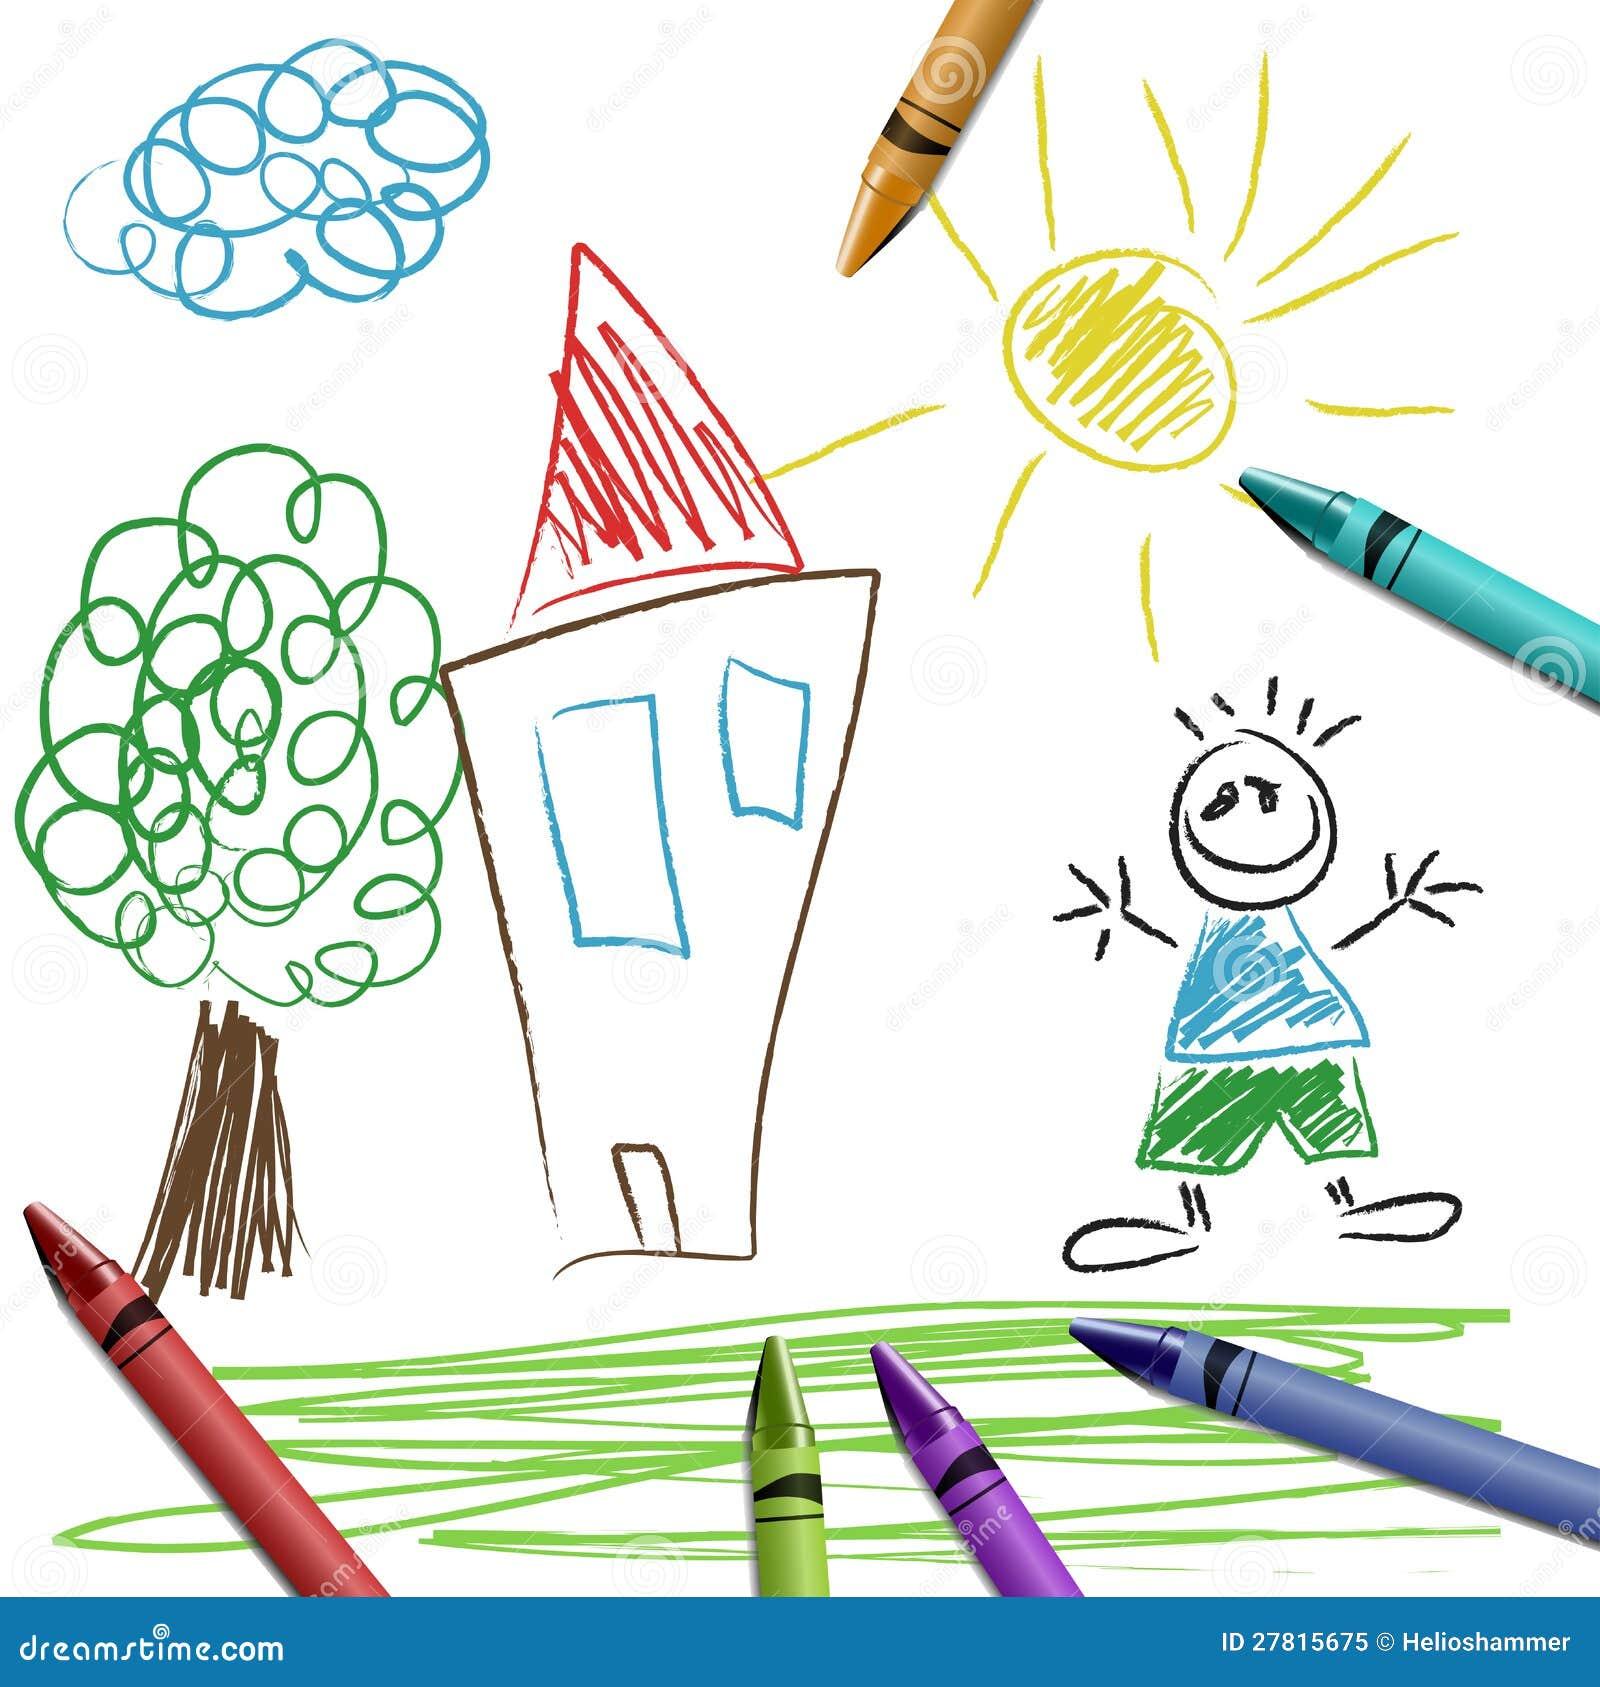 crayon set with kid drawing royalty free stock photo